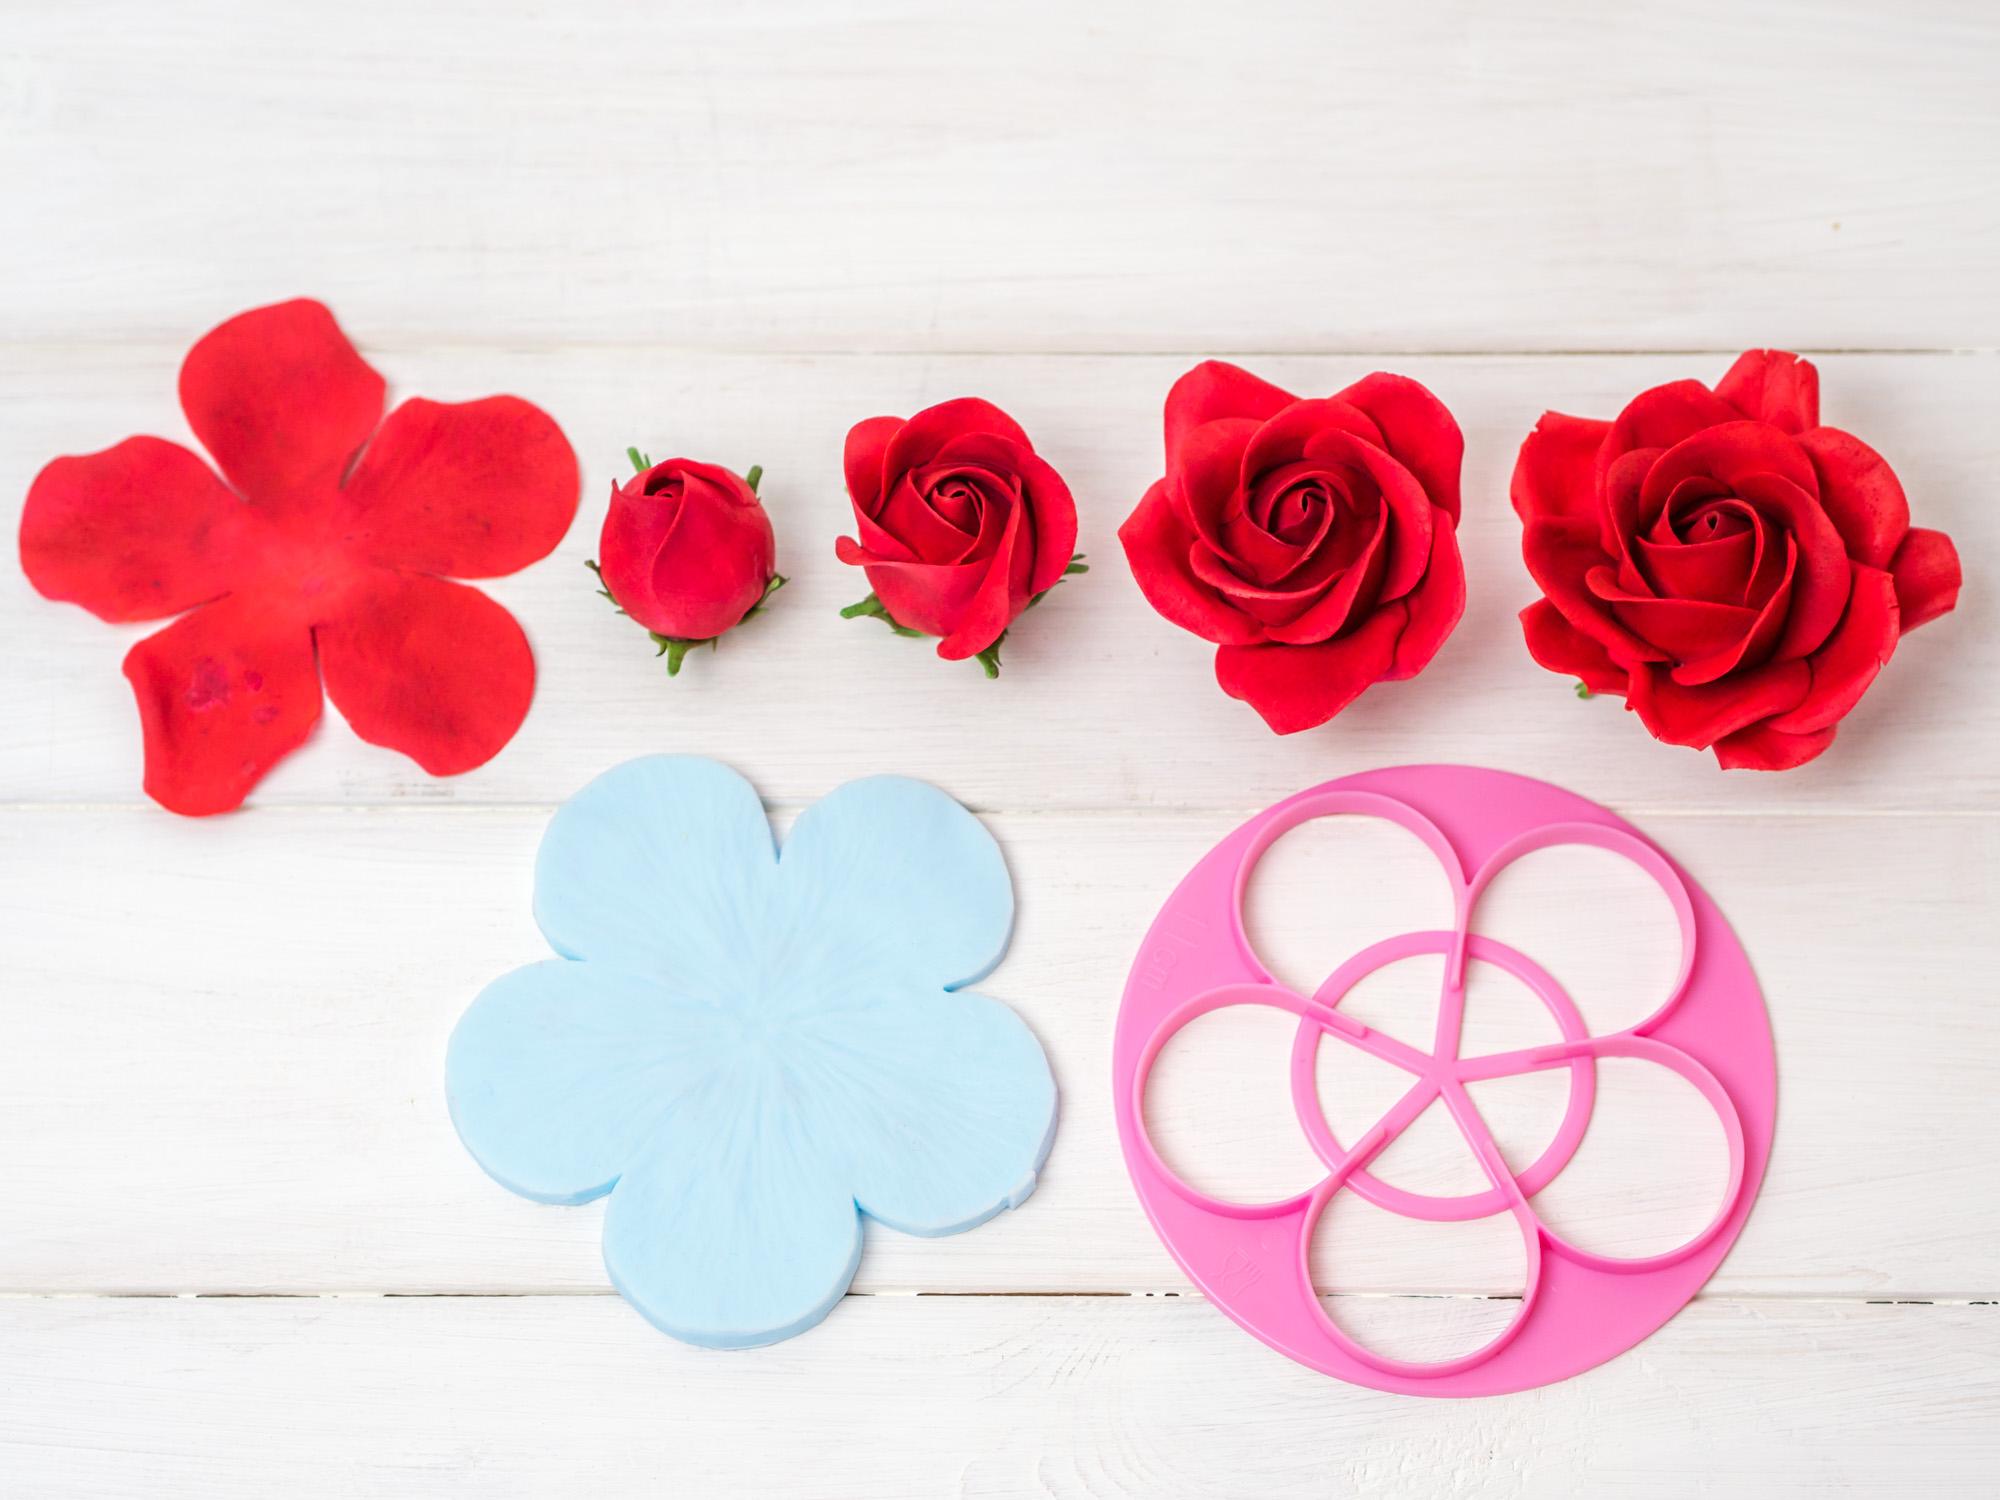 anleitung f r eine rose aus bl tenpaste 5 petal technik. Black Bedroom Furniture Sets. Home Design Ideas